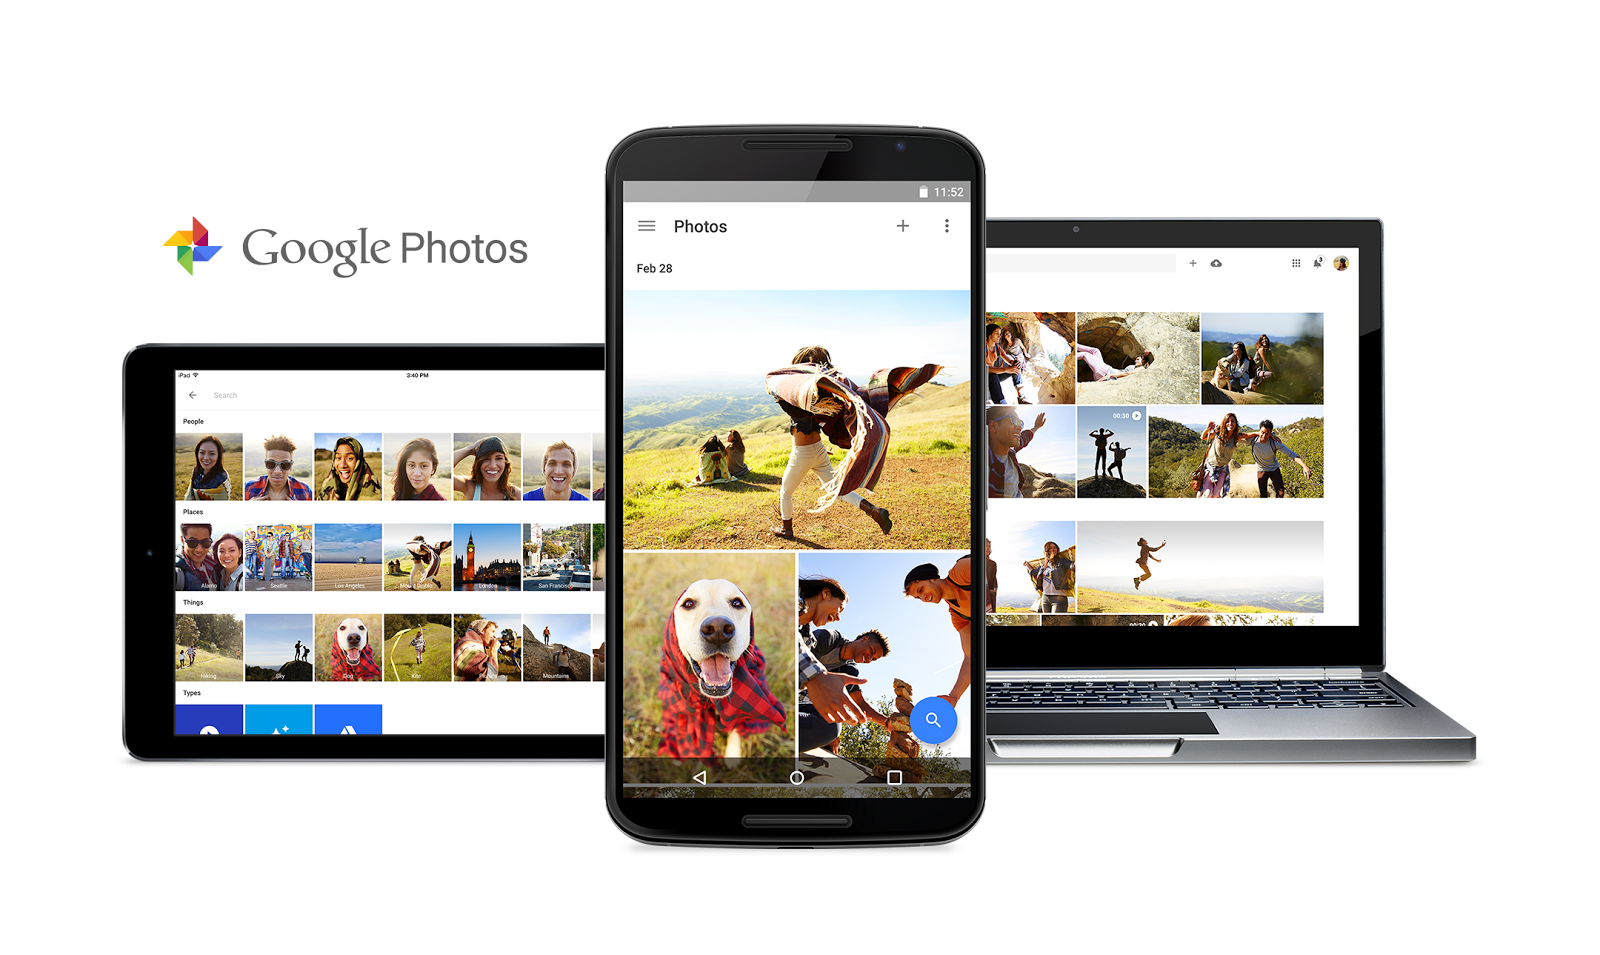 google-introduce-unlimited-photo-hosting-new-photos-app